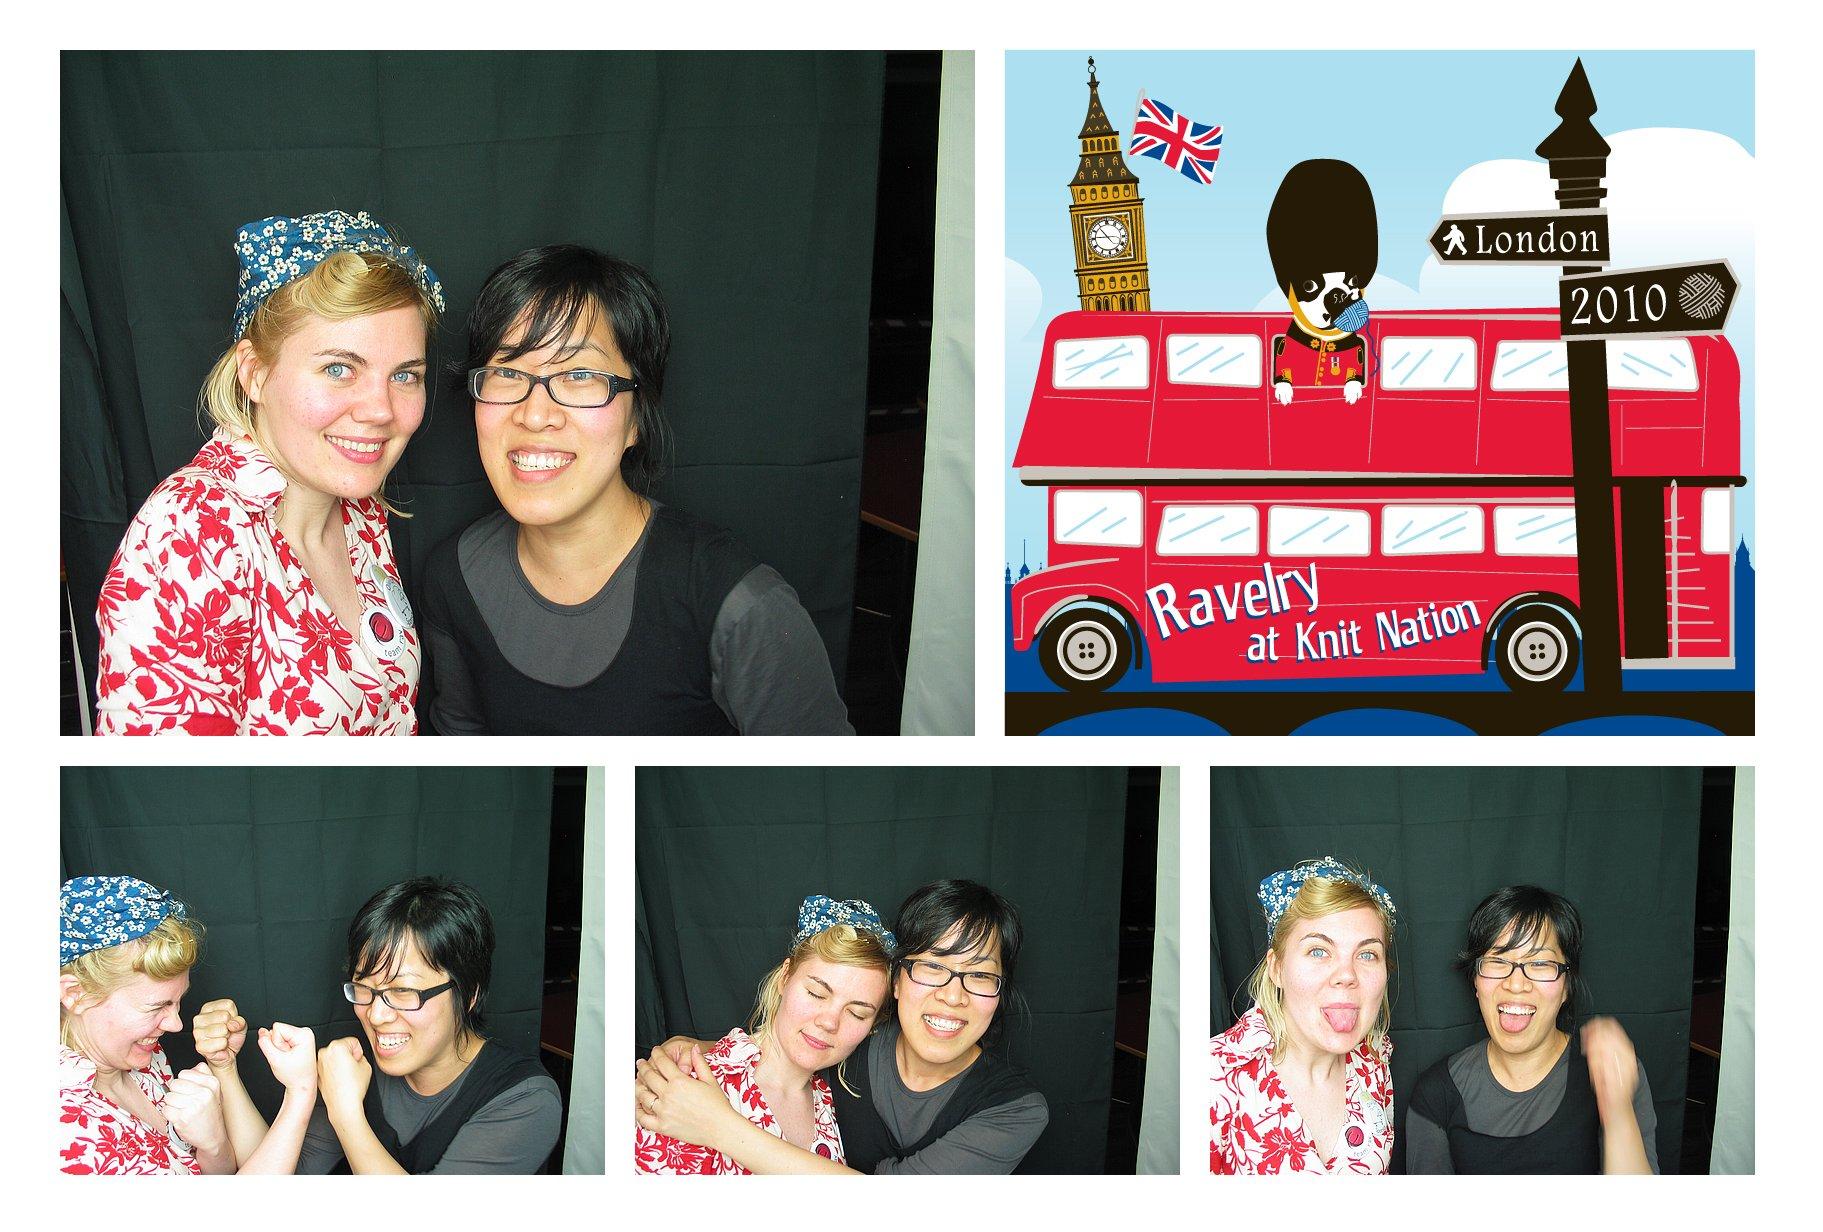 More photo booth fun